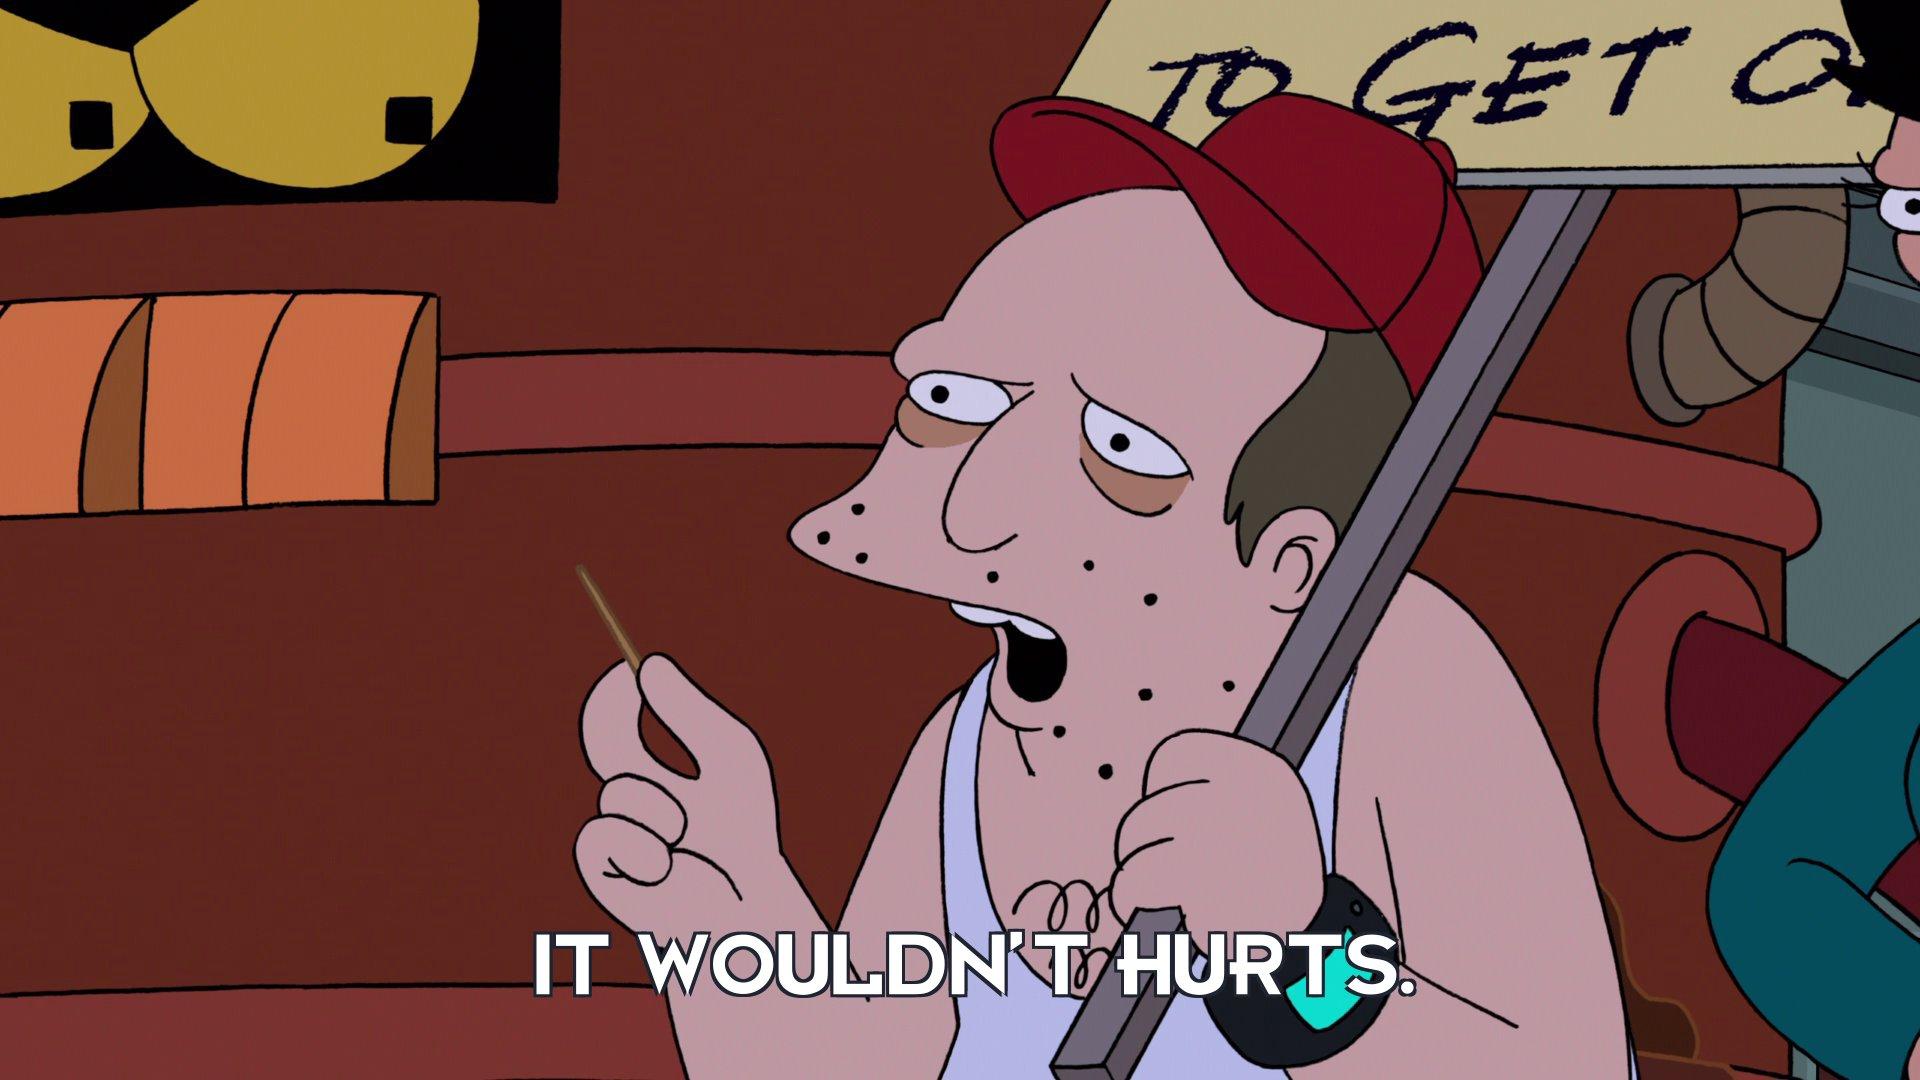 Sal: It wouldn't hurts.